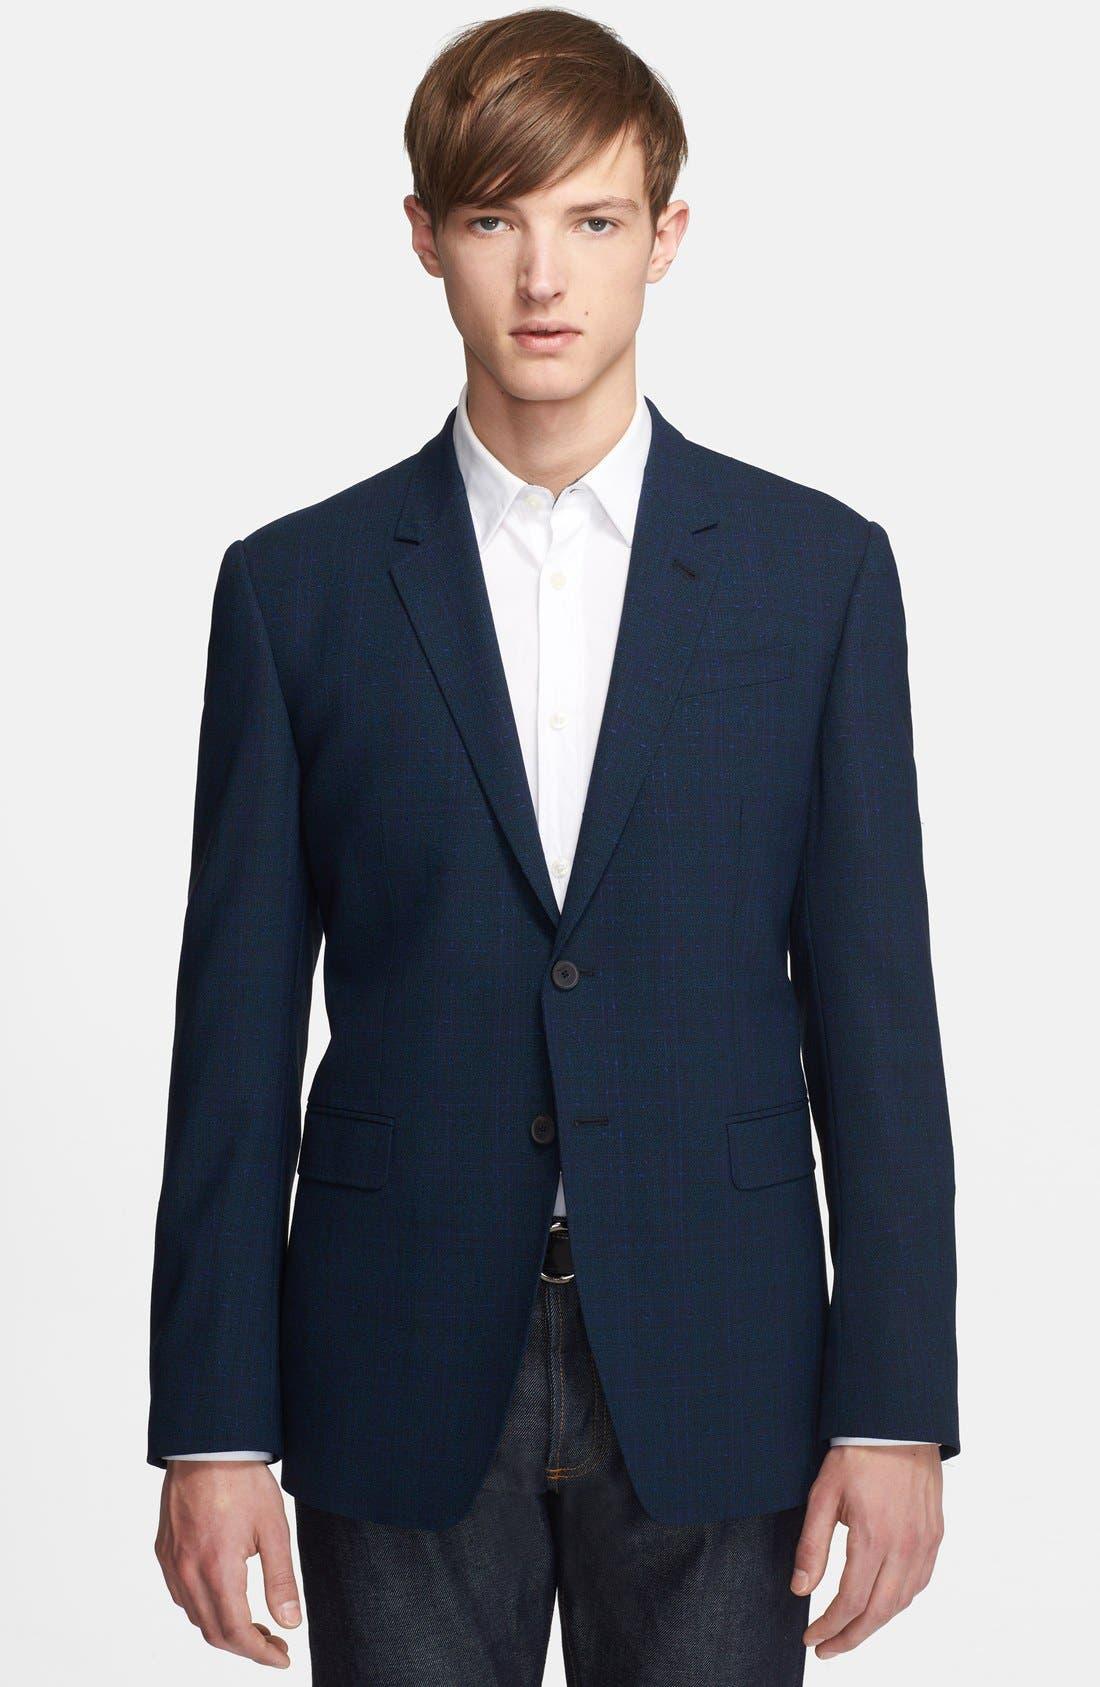 Alternate Image 1 Selected - Paul Smith London 'Byard Tex' Plaid Wool Sportcoat